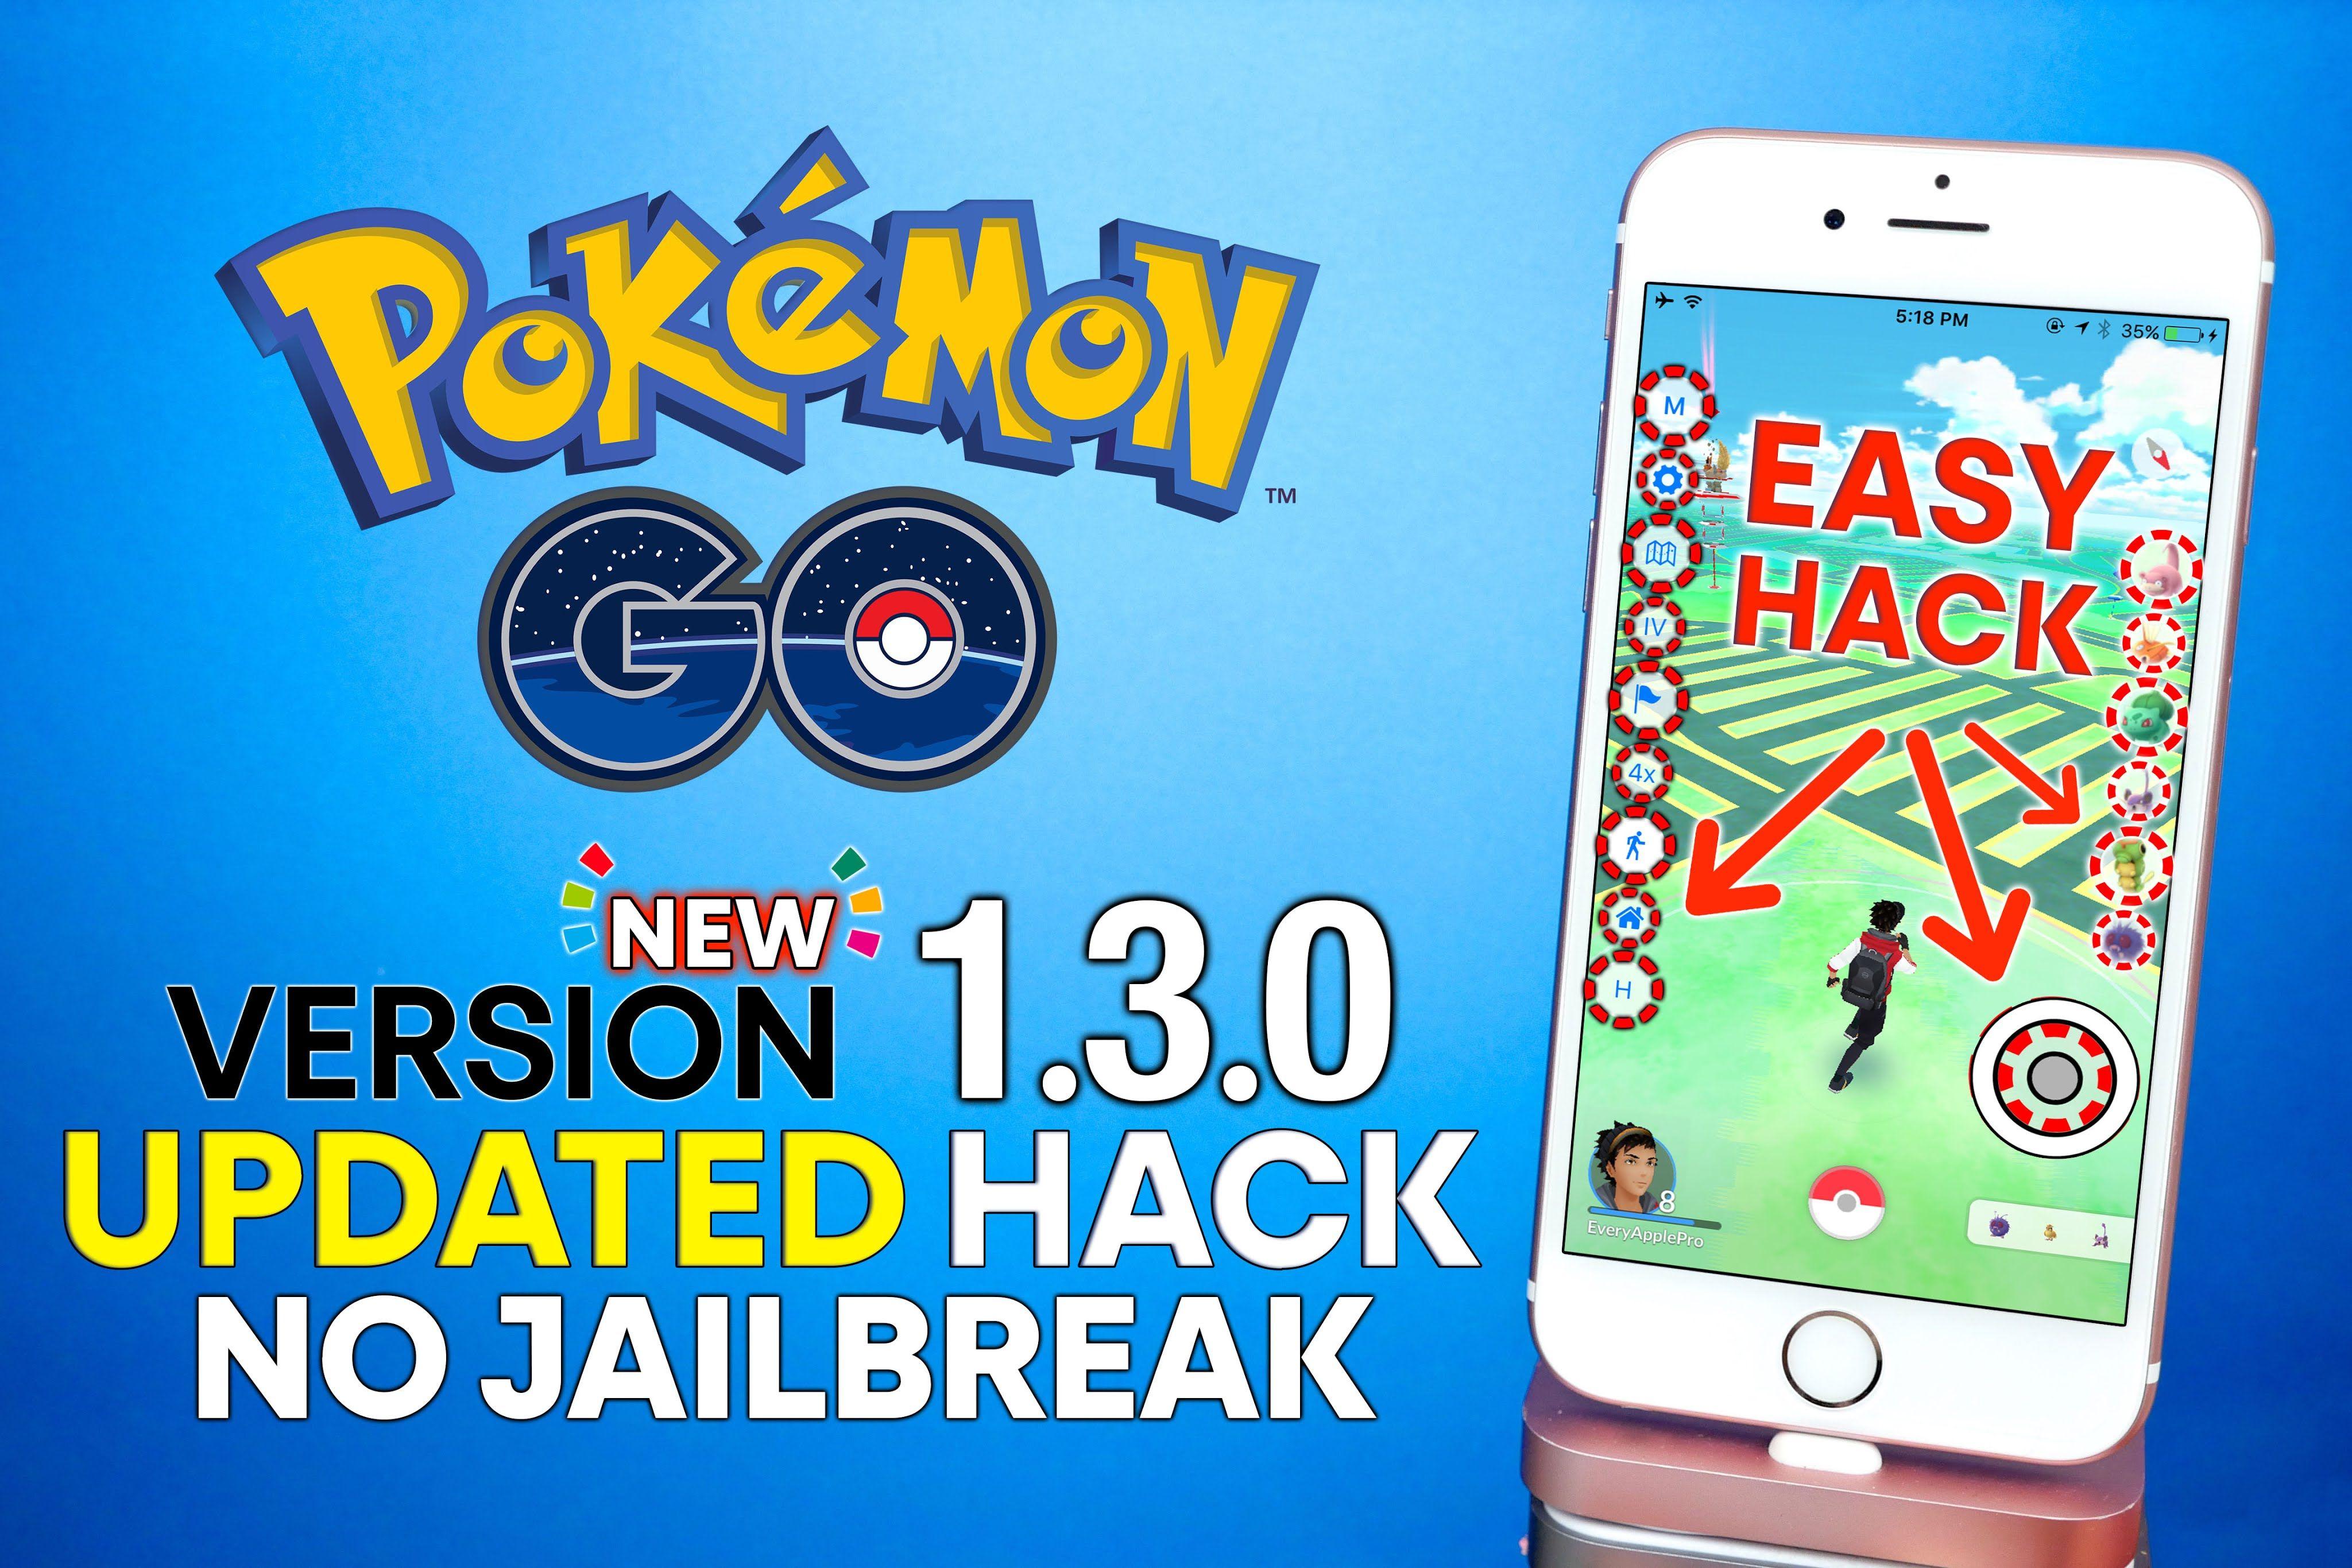 Pokemon GO 1.3.0 Hack NO Jailbreak! Tap To Walk, Map Hack